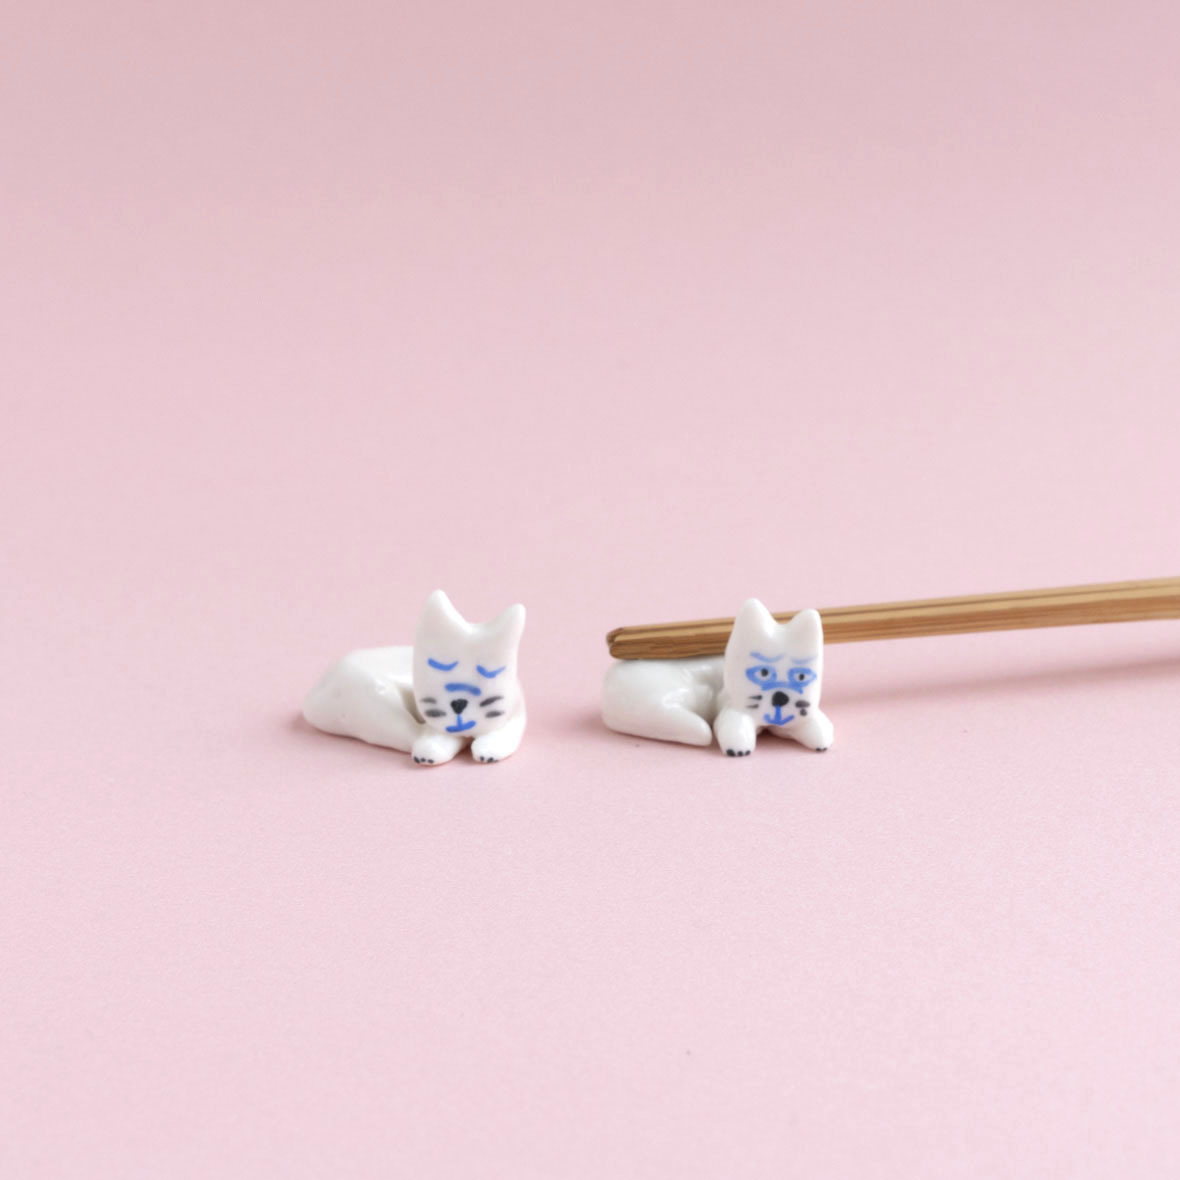 【TK】箸置き(ねこ・ラウンド)NO.8